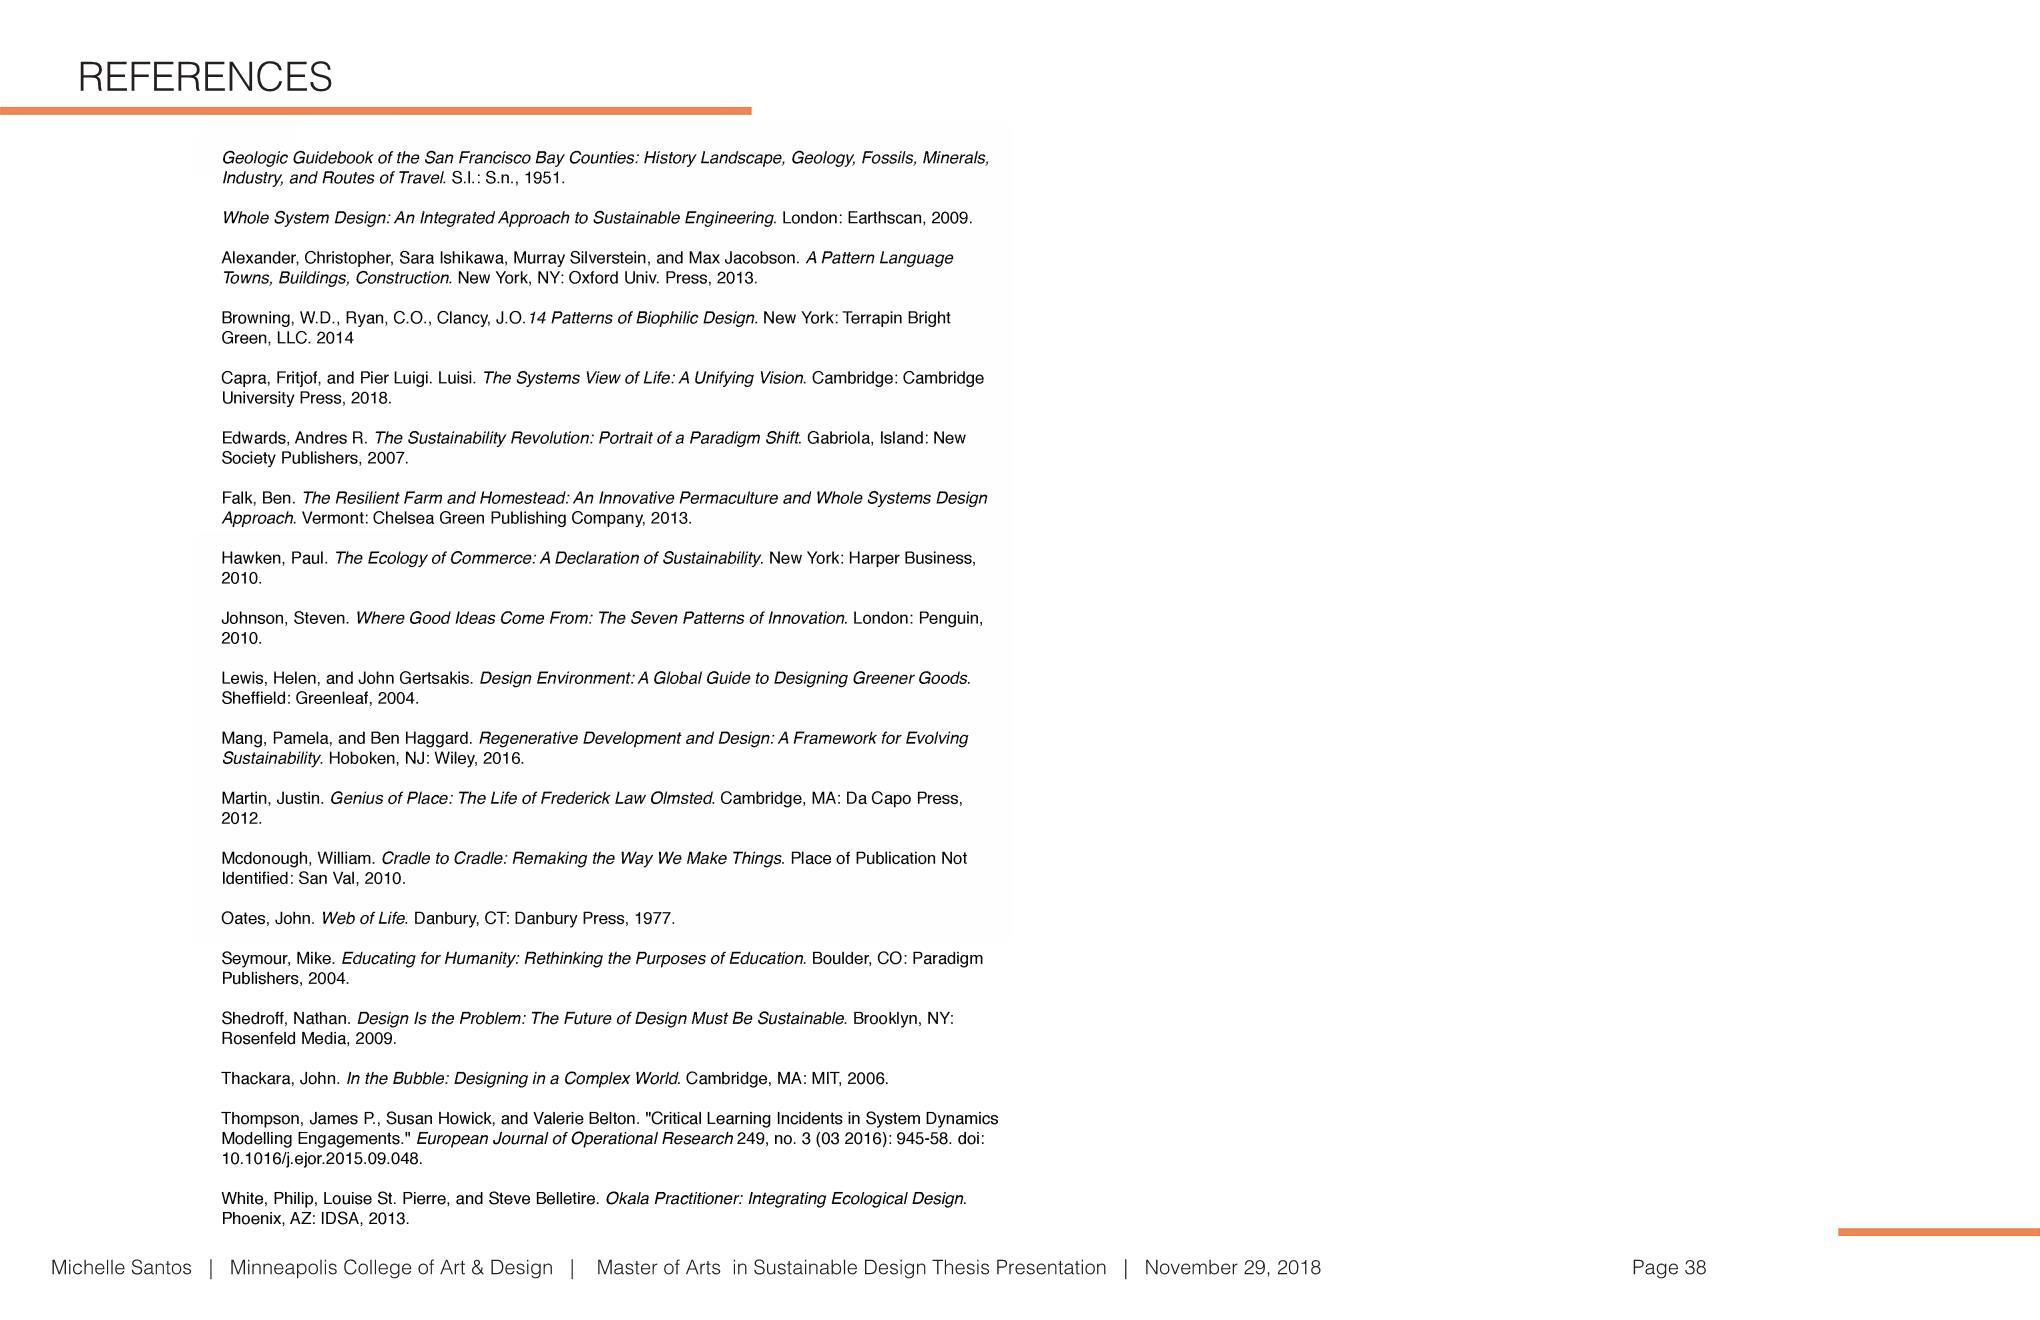 MSantos_Thesis Presentation_2018.12.11_small2 Page 043.jpg